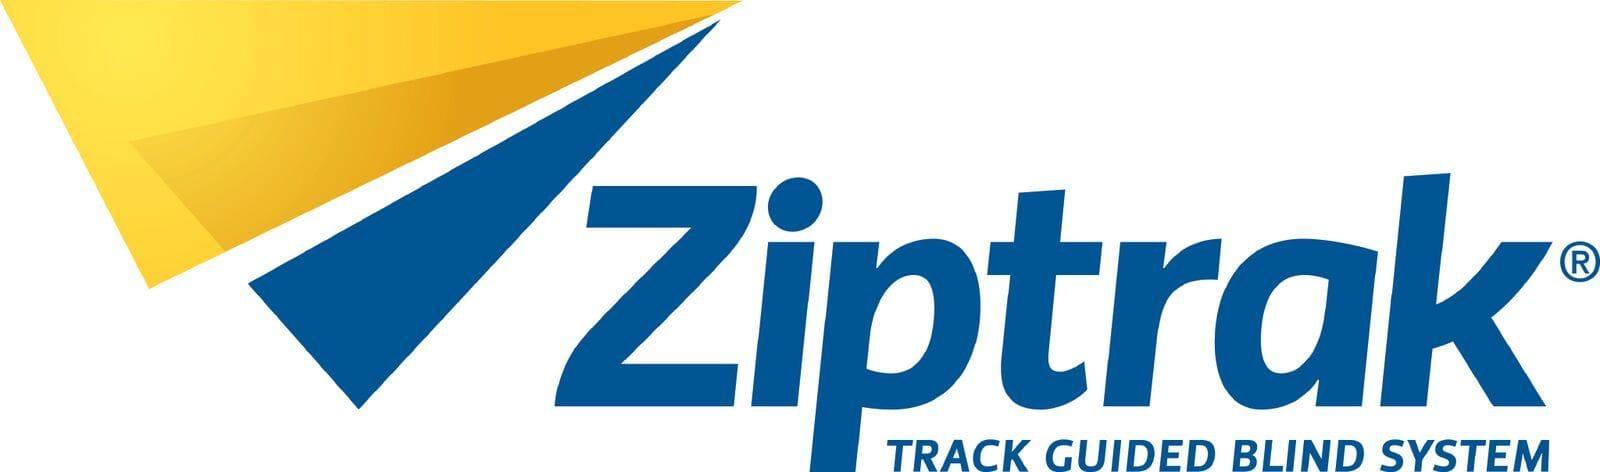 Ziptrak Track Guided Blind System | Custom Blinds & Shutters Gold Coast